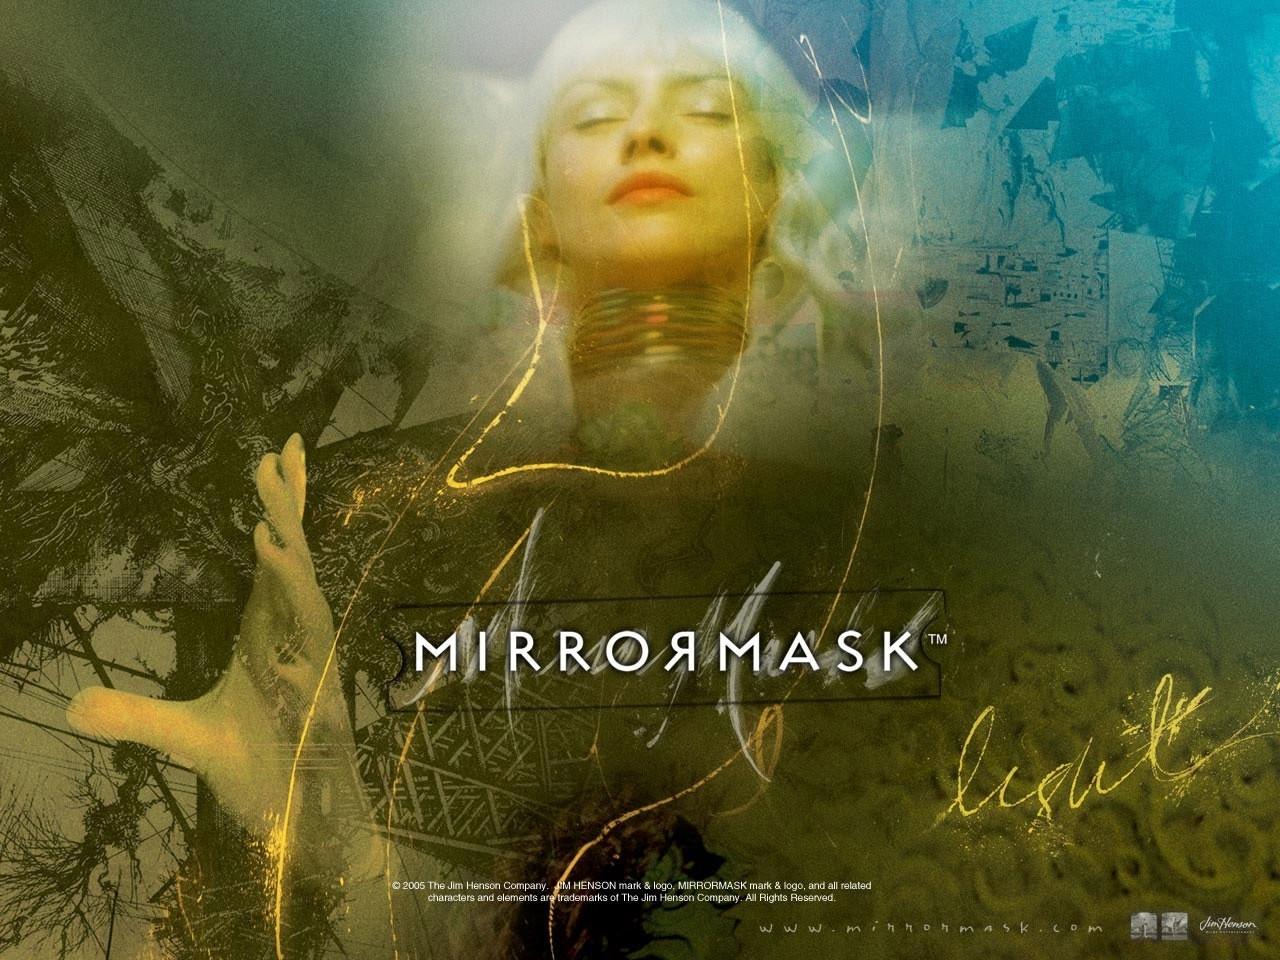 Wallpaper del film MirrorMask